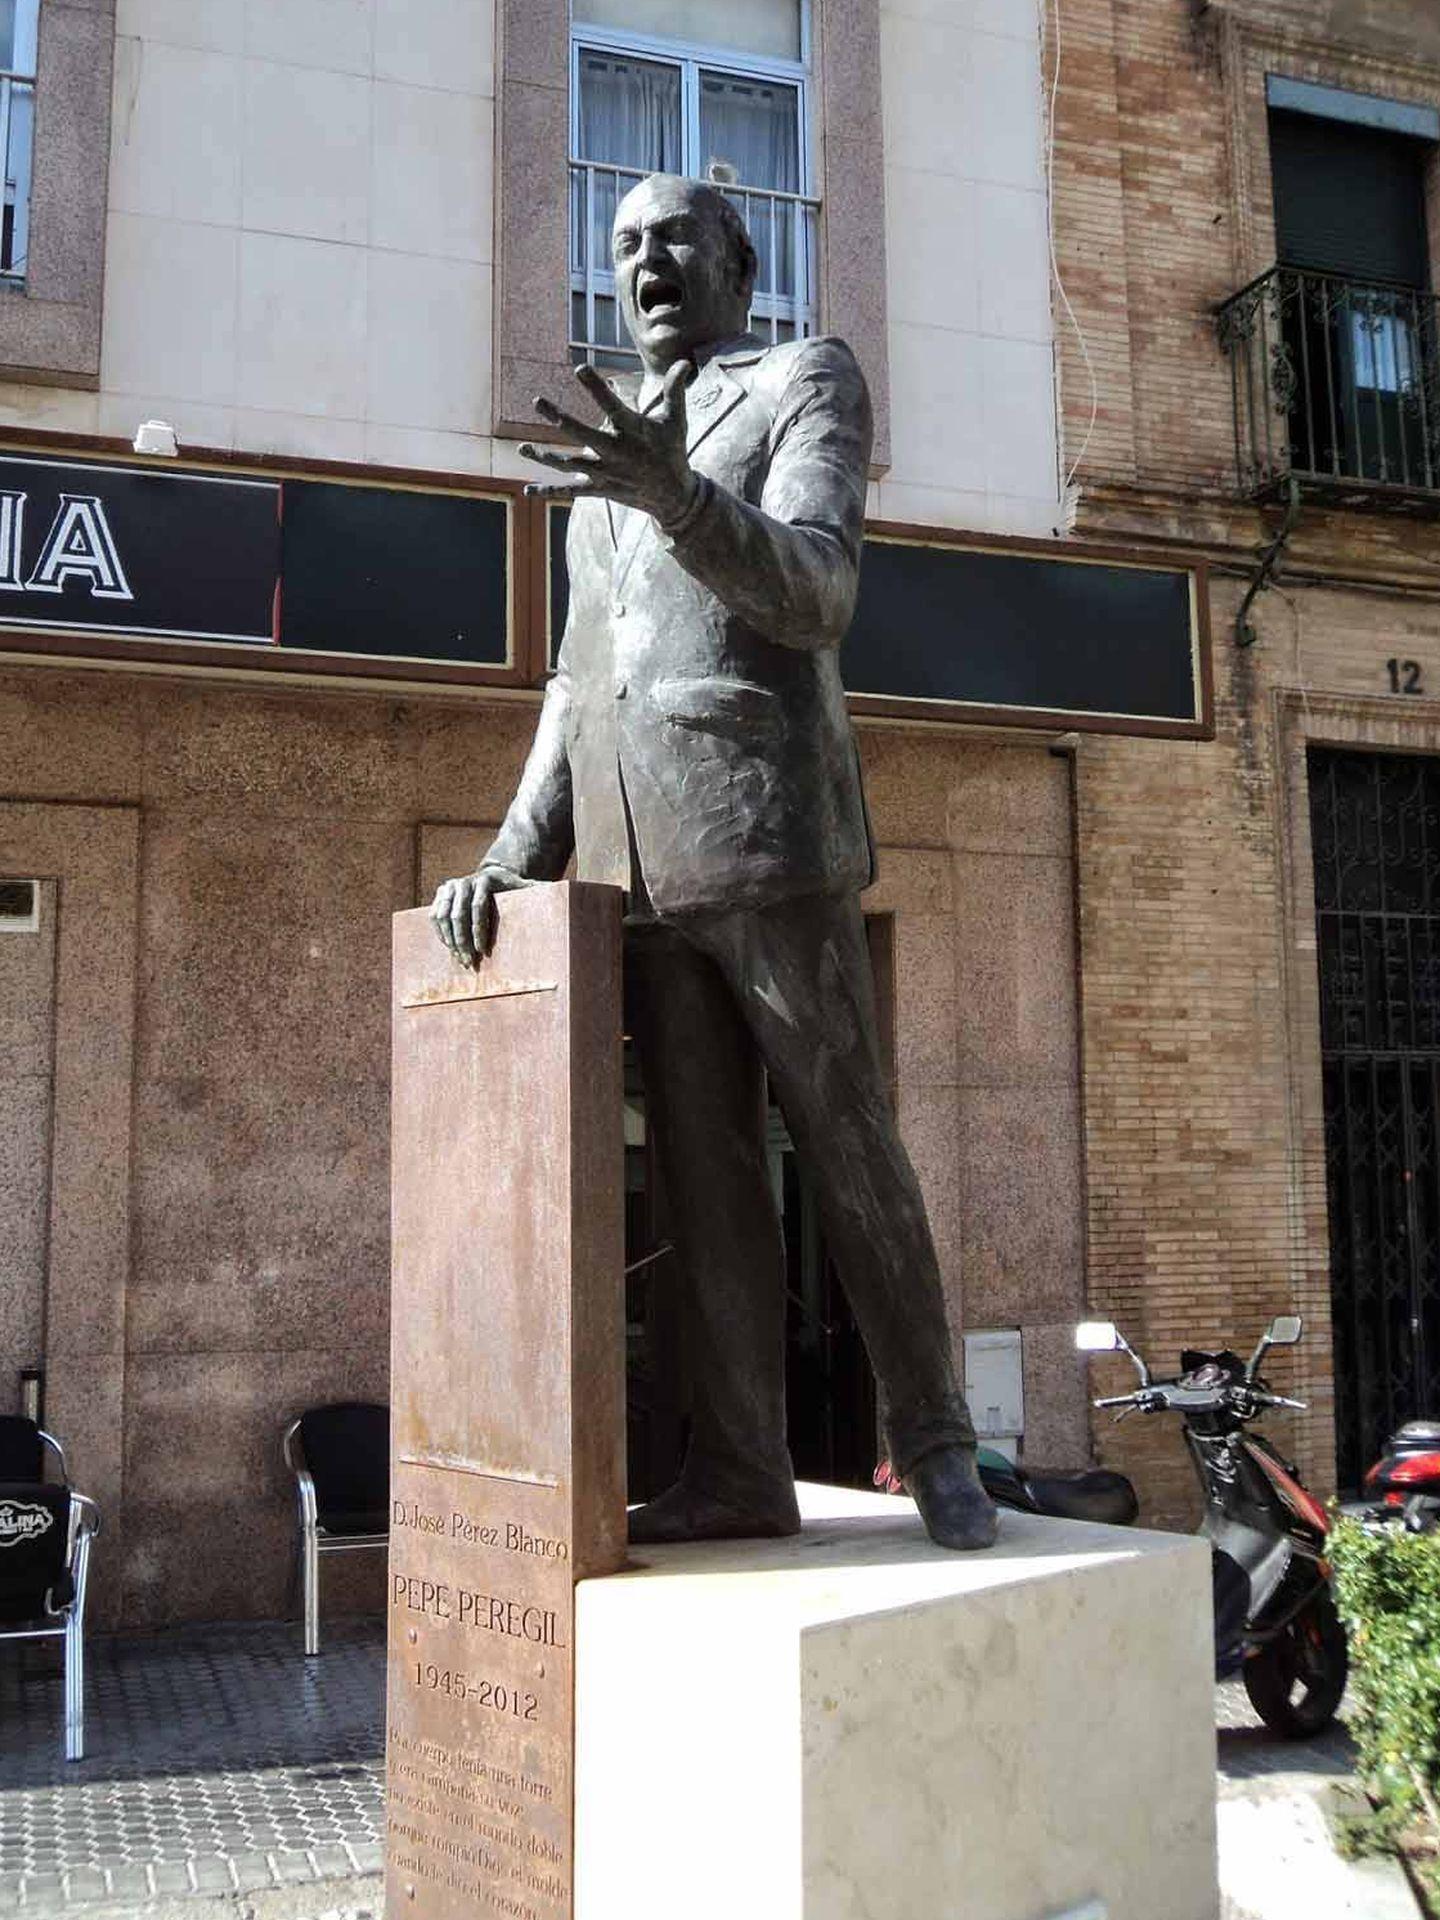 Monumento al cantaor Pepe Perejil, de José Antonio Navarro Arteaga. (navarroarteaga.com)